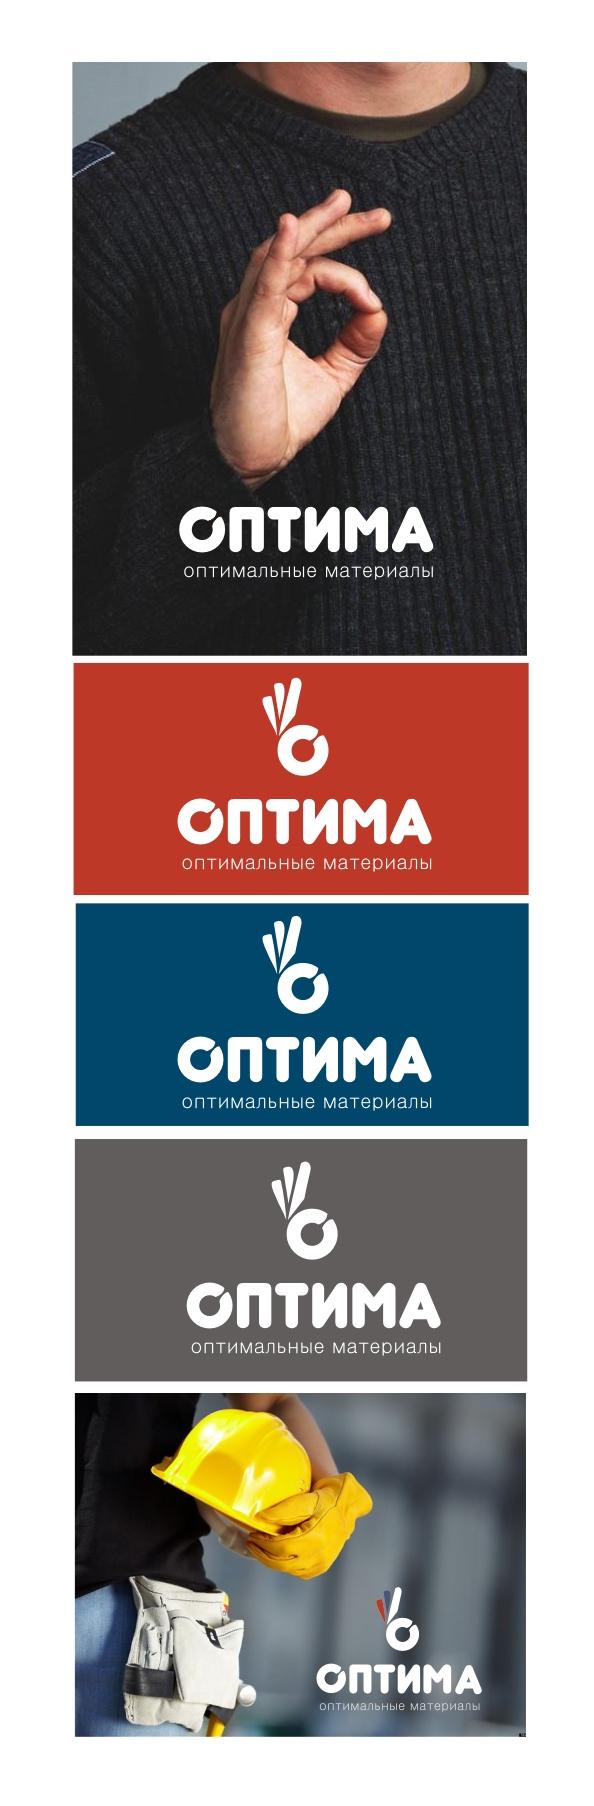 "Логотип ""Оптима"" (строительные материалы)"